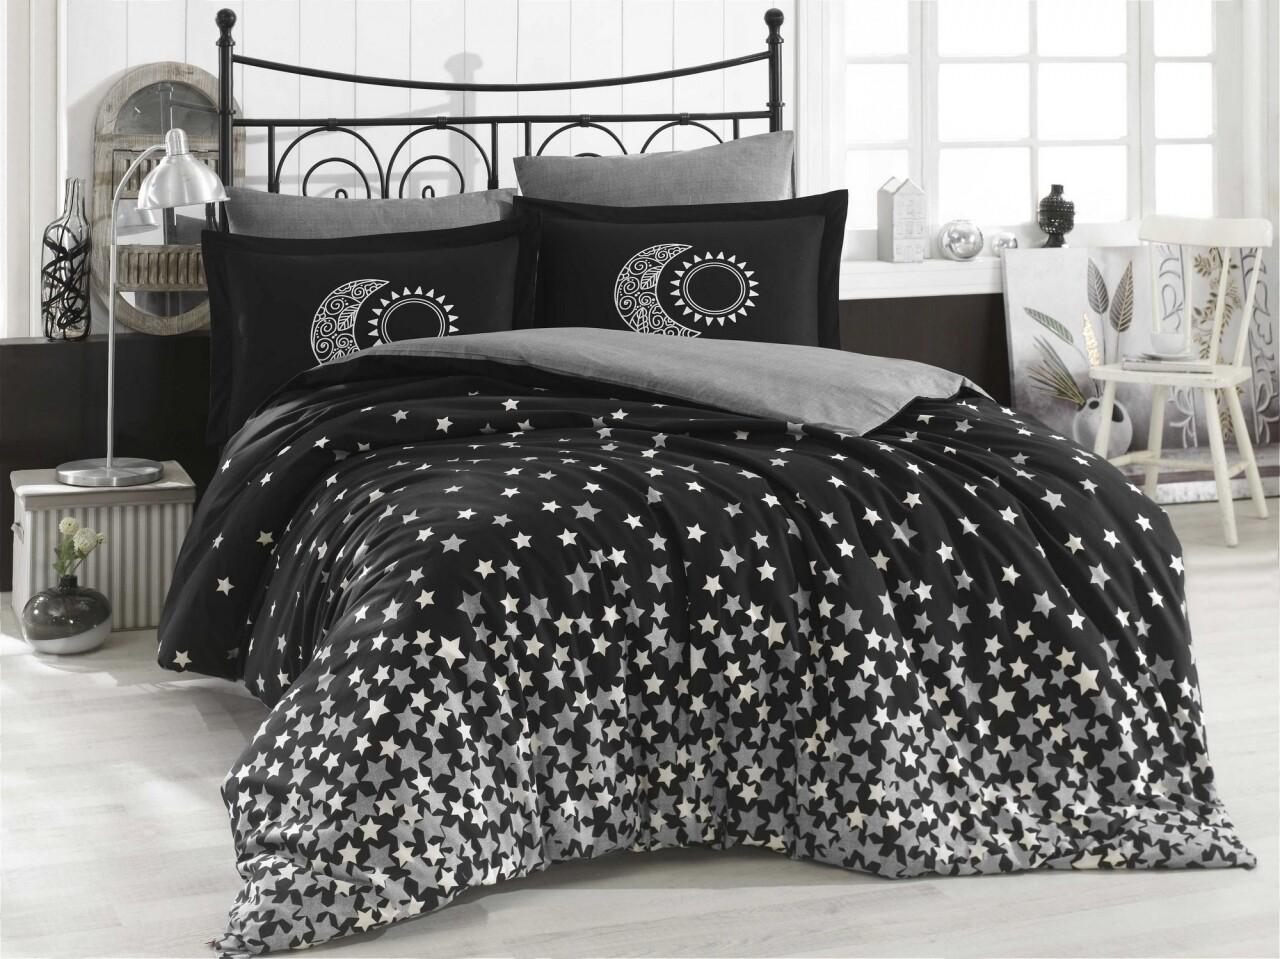 Lenjerie de pat dubla, 4 piese, 100% bumbac poplin, Hobby, Star's, alb/negru